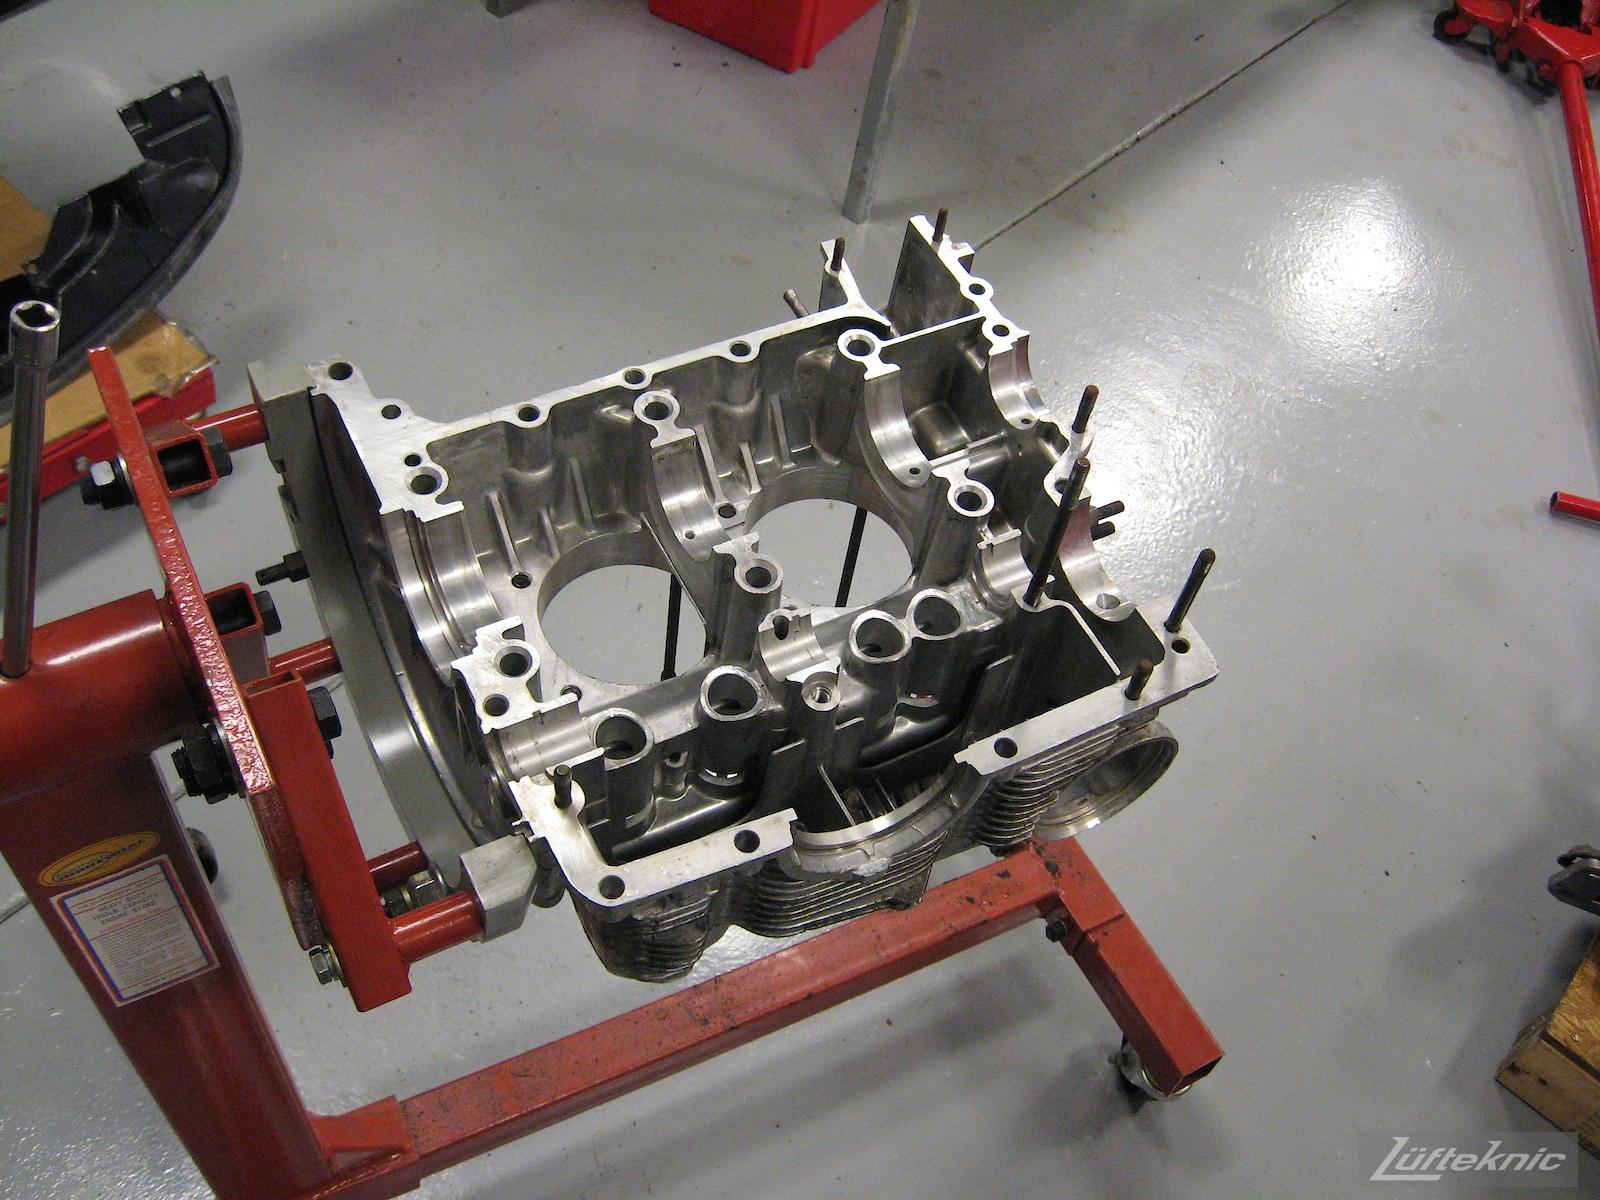 Stripped down Porsche engine case on a stand.